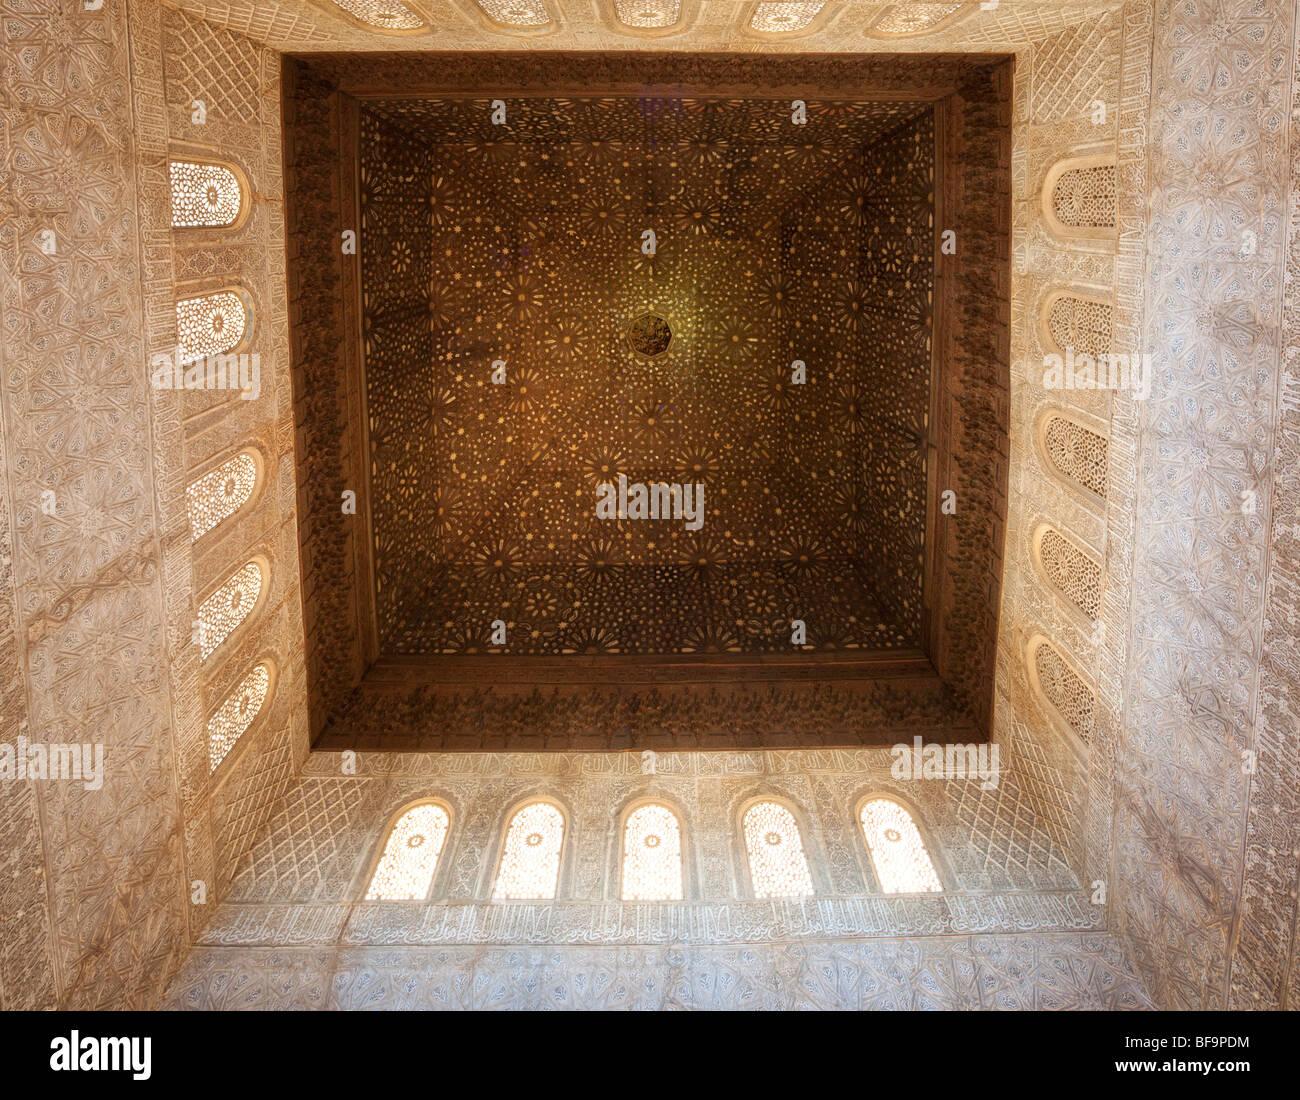 Hall of the Ambassadors (Salón de los Embajadores), the Alhambra Stock Photo,...